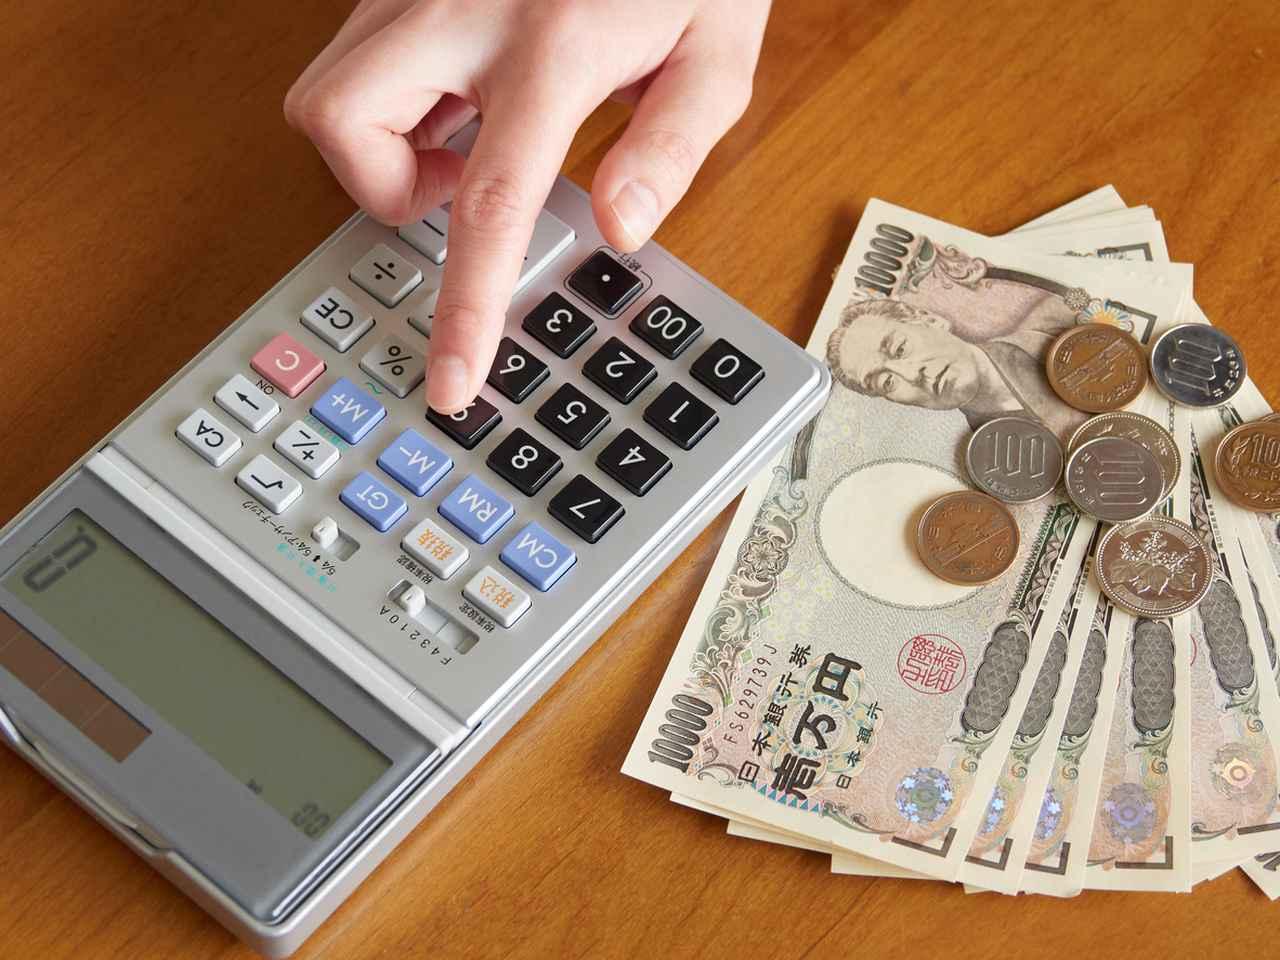 画像: 画像:iStock.com/kazuma seki